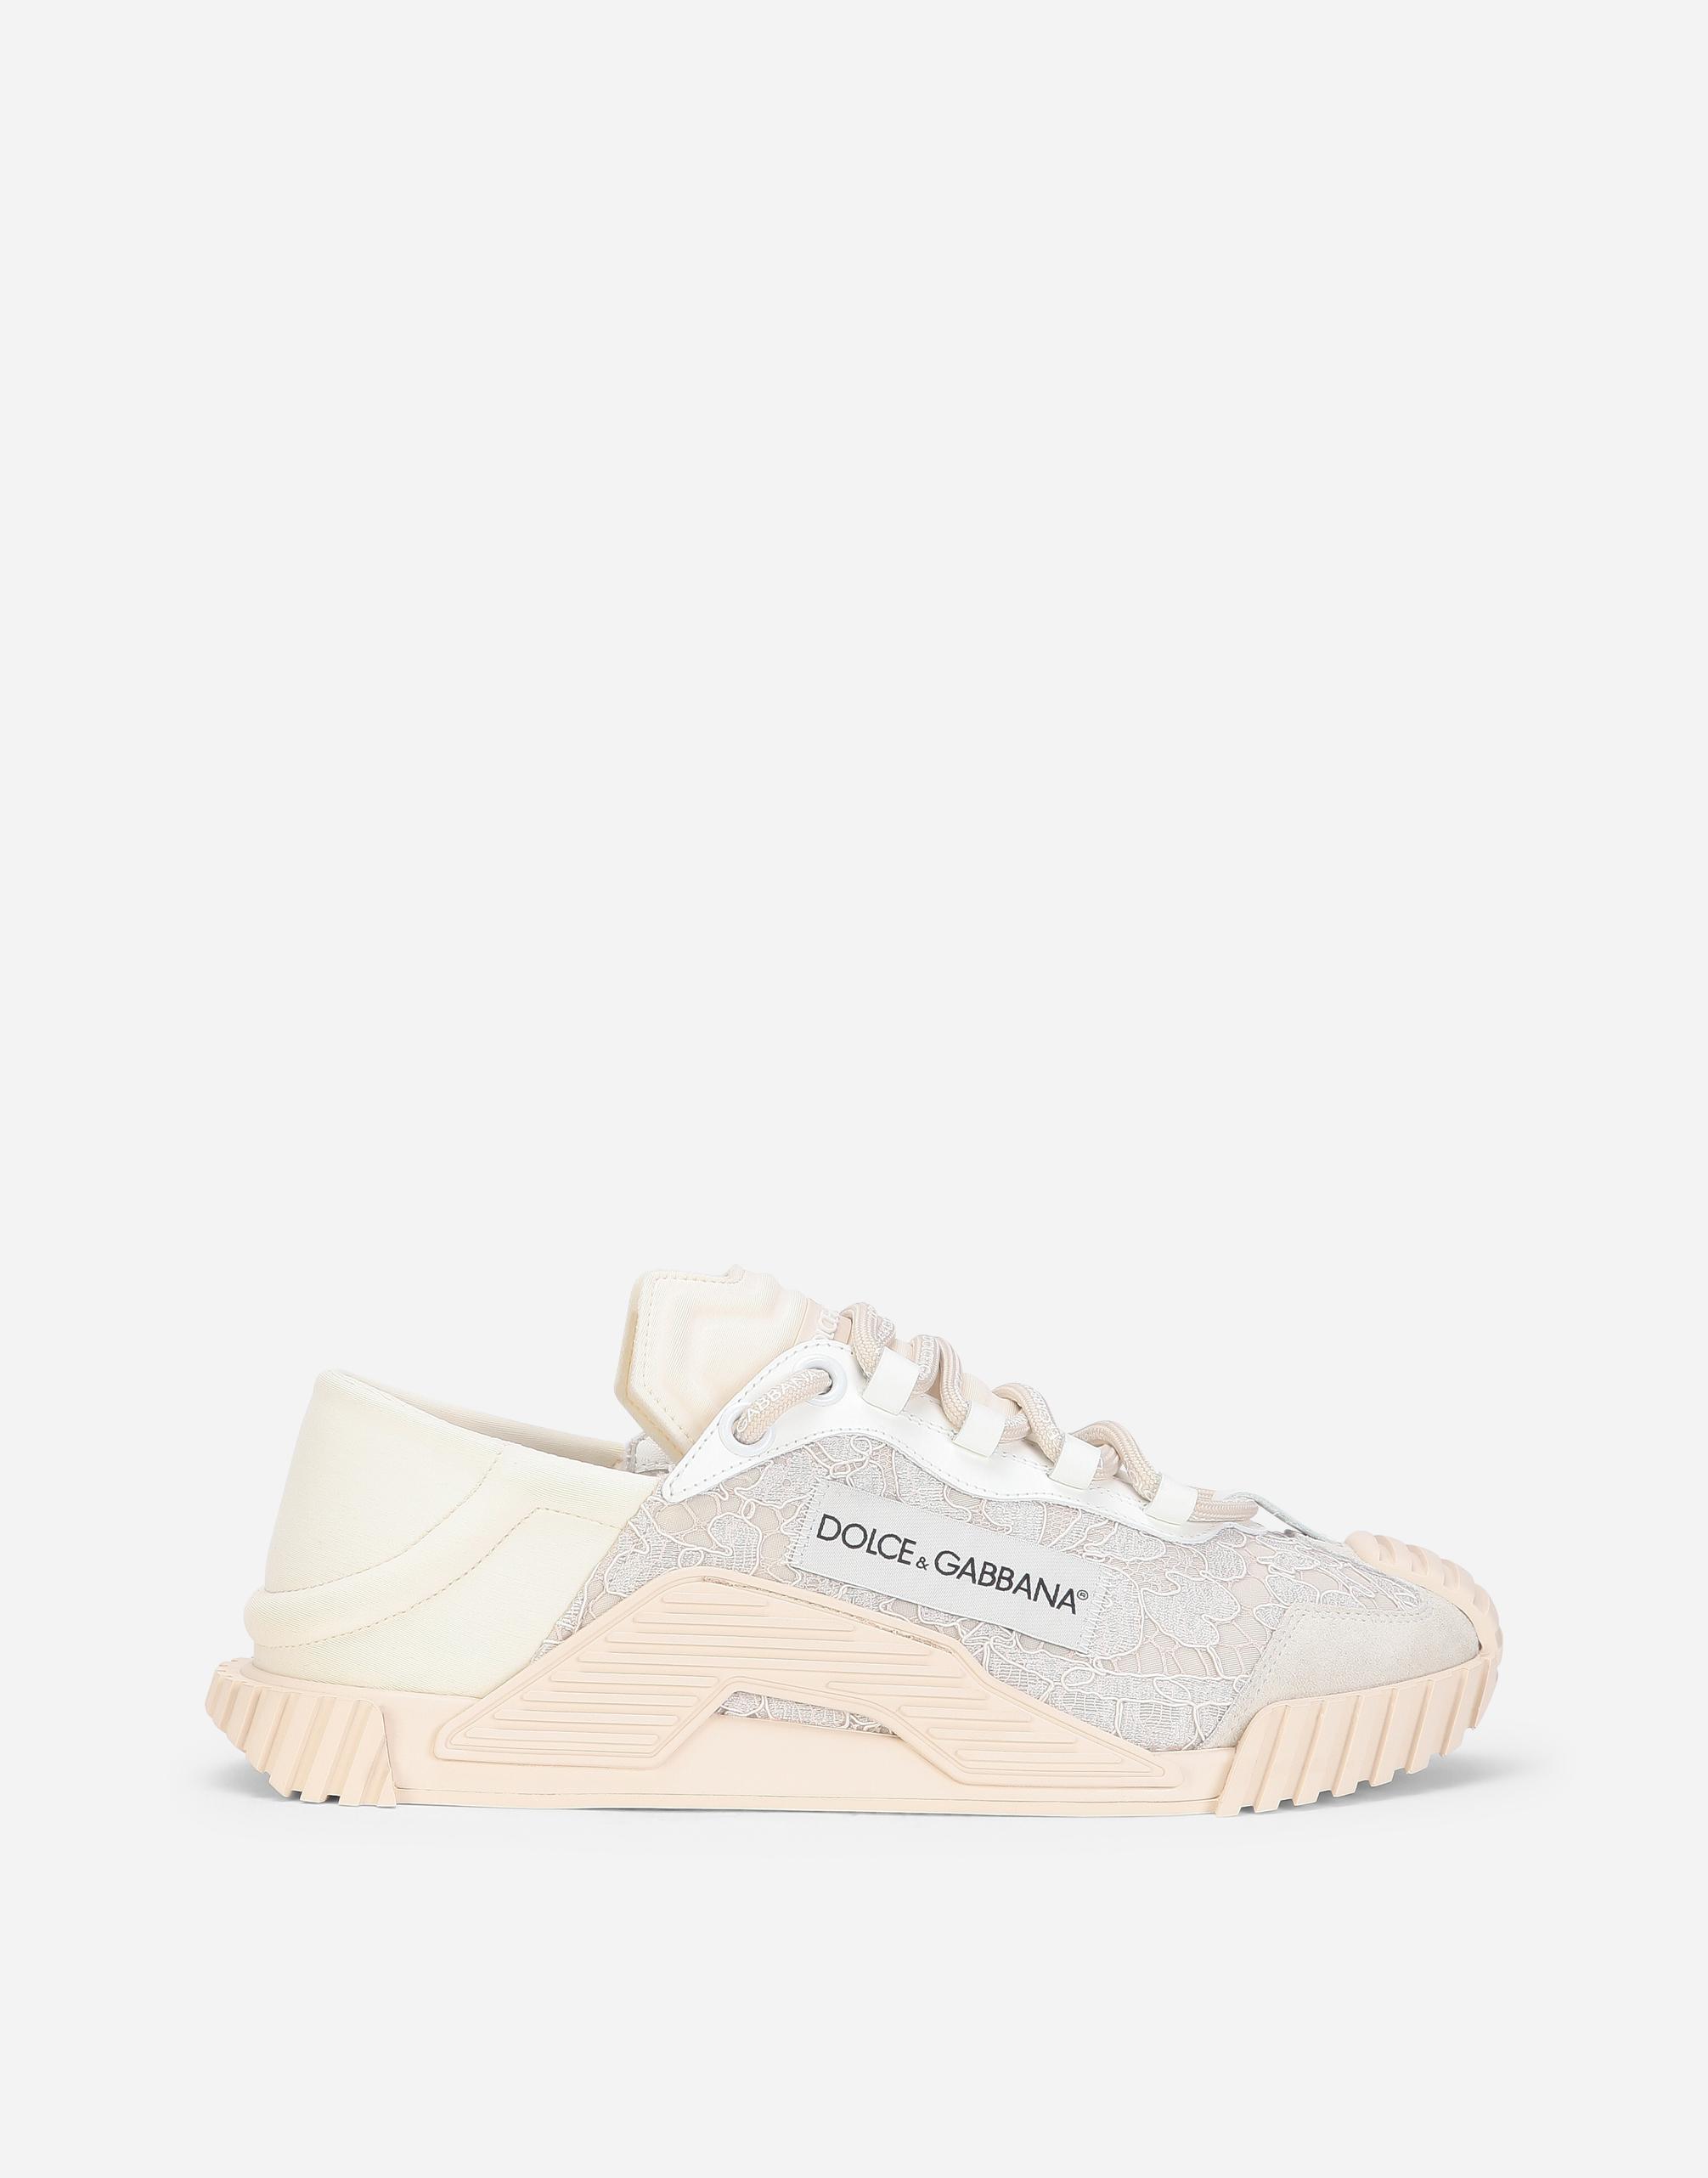 Zapatillas de Mujer   Dolce&Gabbana ZAPATILLAS NS1 SLIP ON